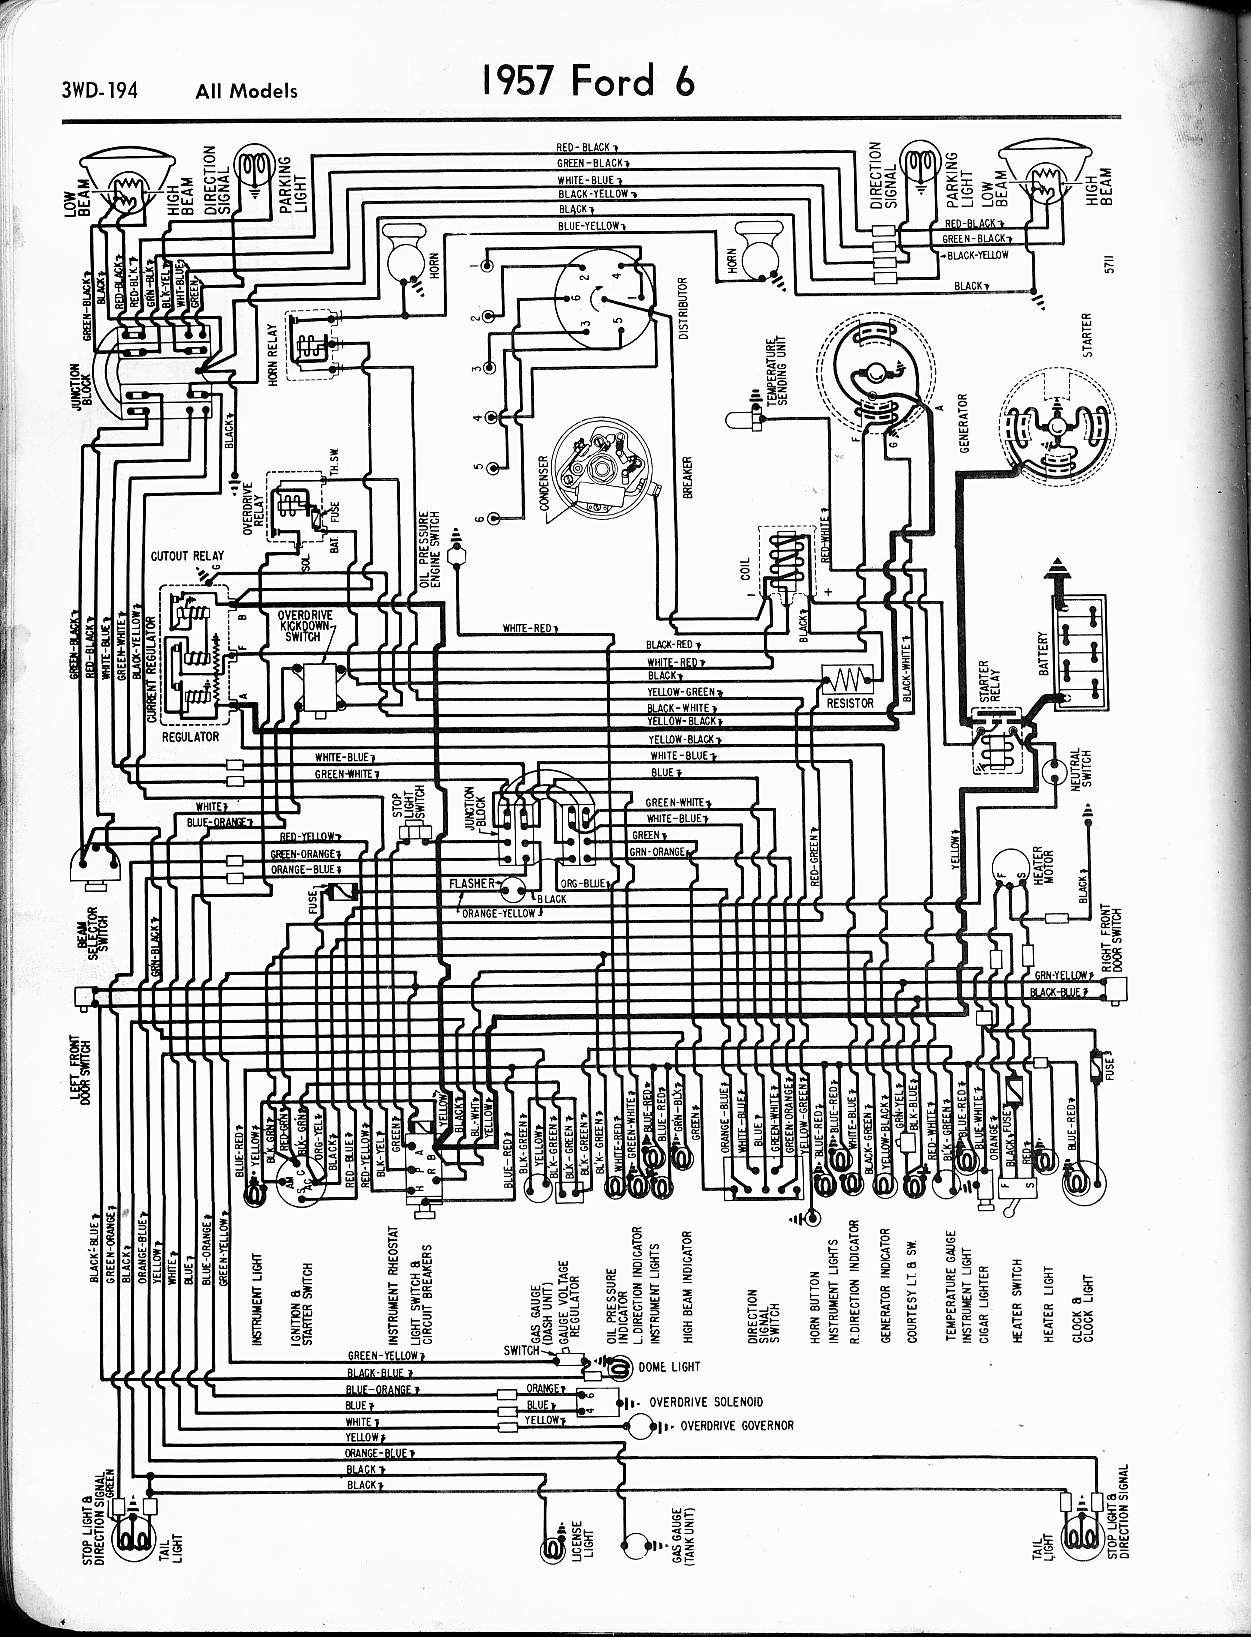 Ford Wiring Diagrams Wrg 7511 1961 Ford Generator Wiring Diagram